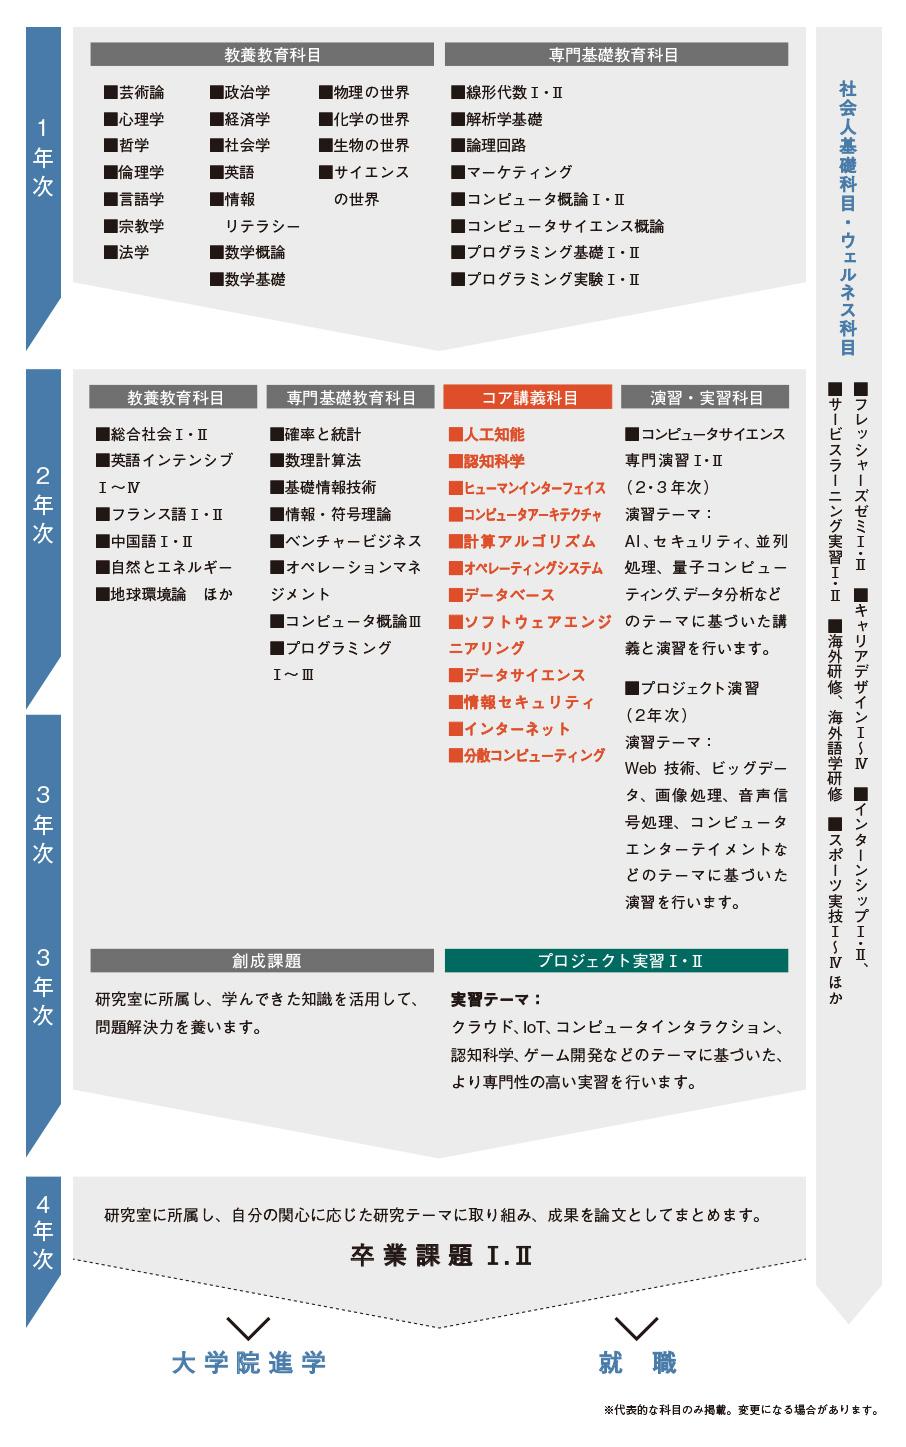 https://www.teu.ac.jp/gakubu/images/cs_images/cs_curiclm180619.jpg